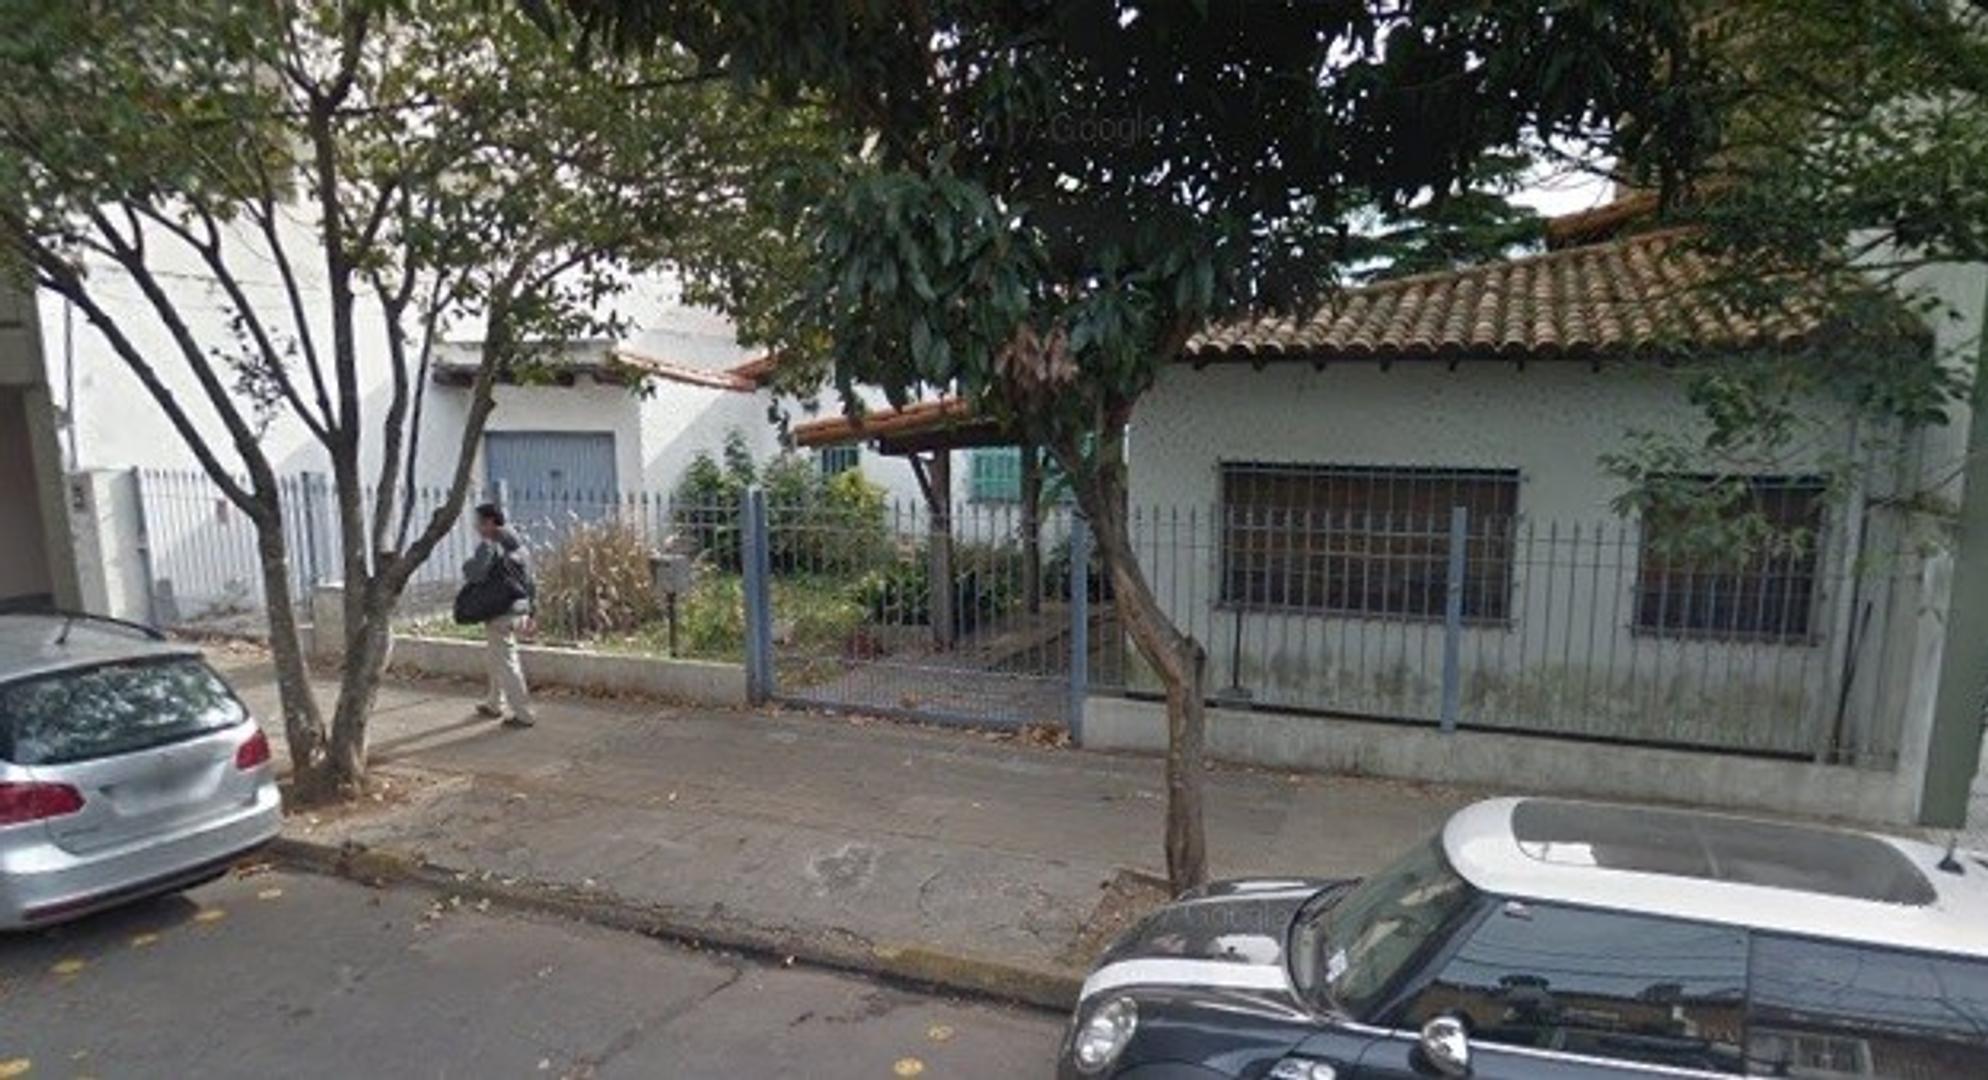 UNICO LOTE DE 17X50 PARA EDIFICAR EN ALTURA A MEDIA CUADRA DE AV. MAIPU